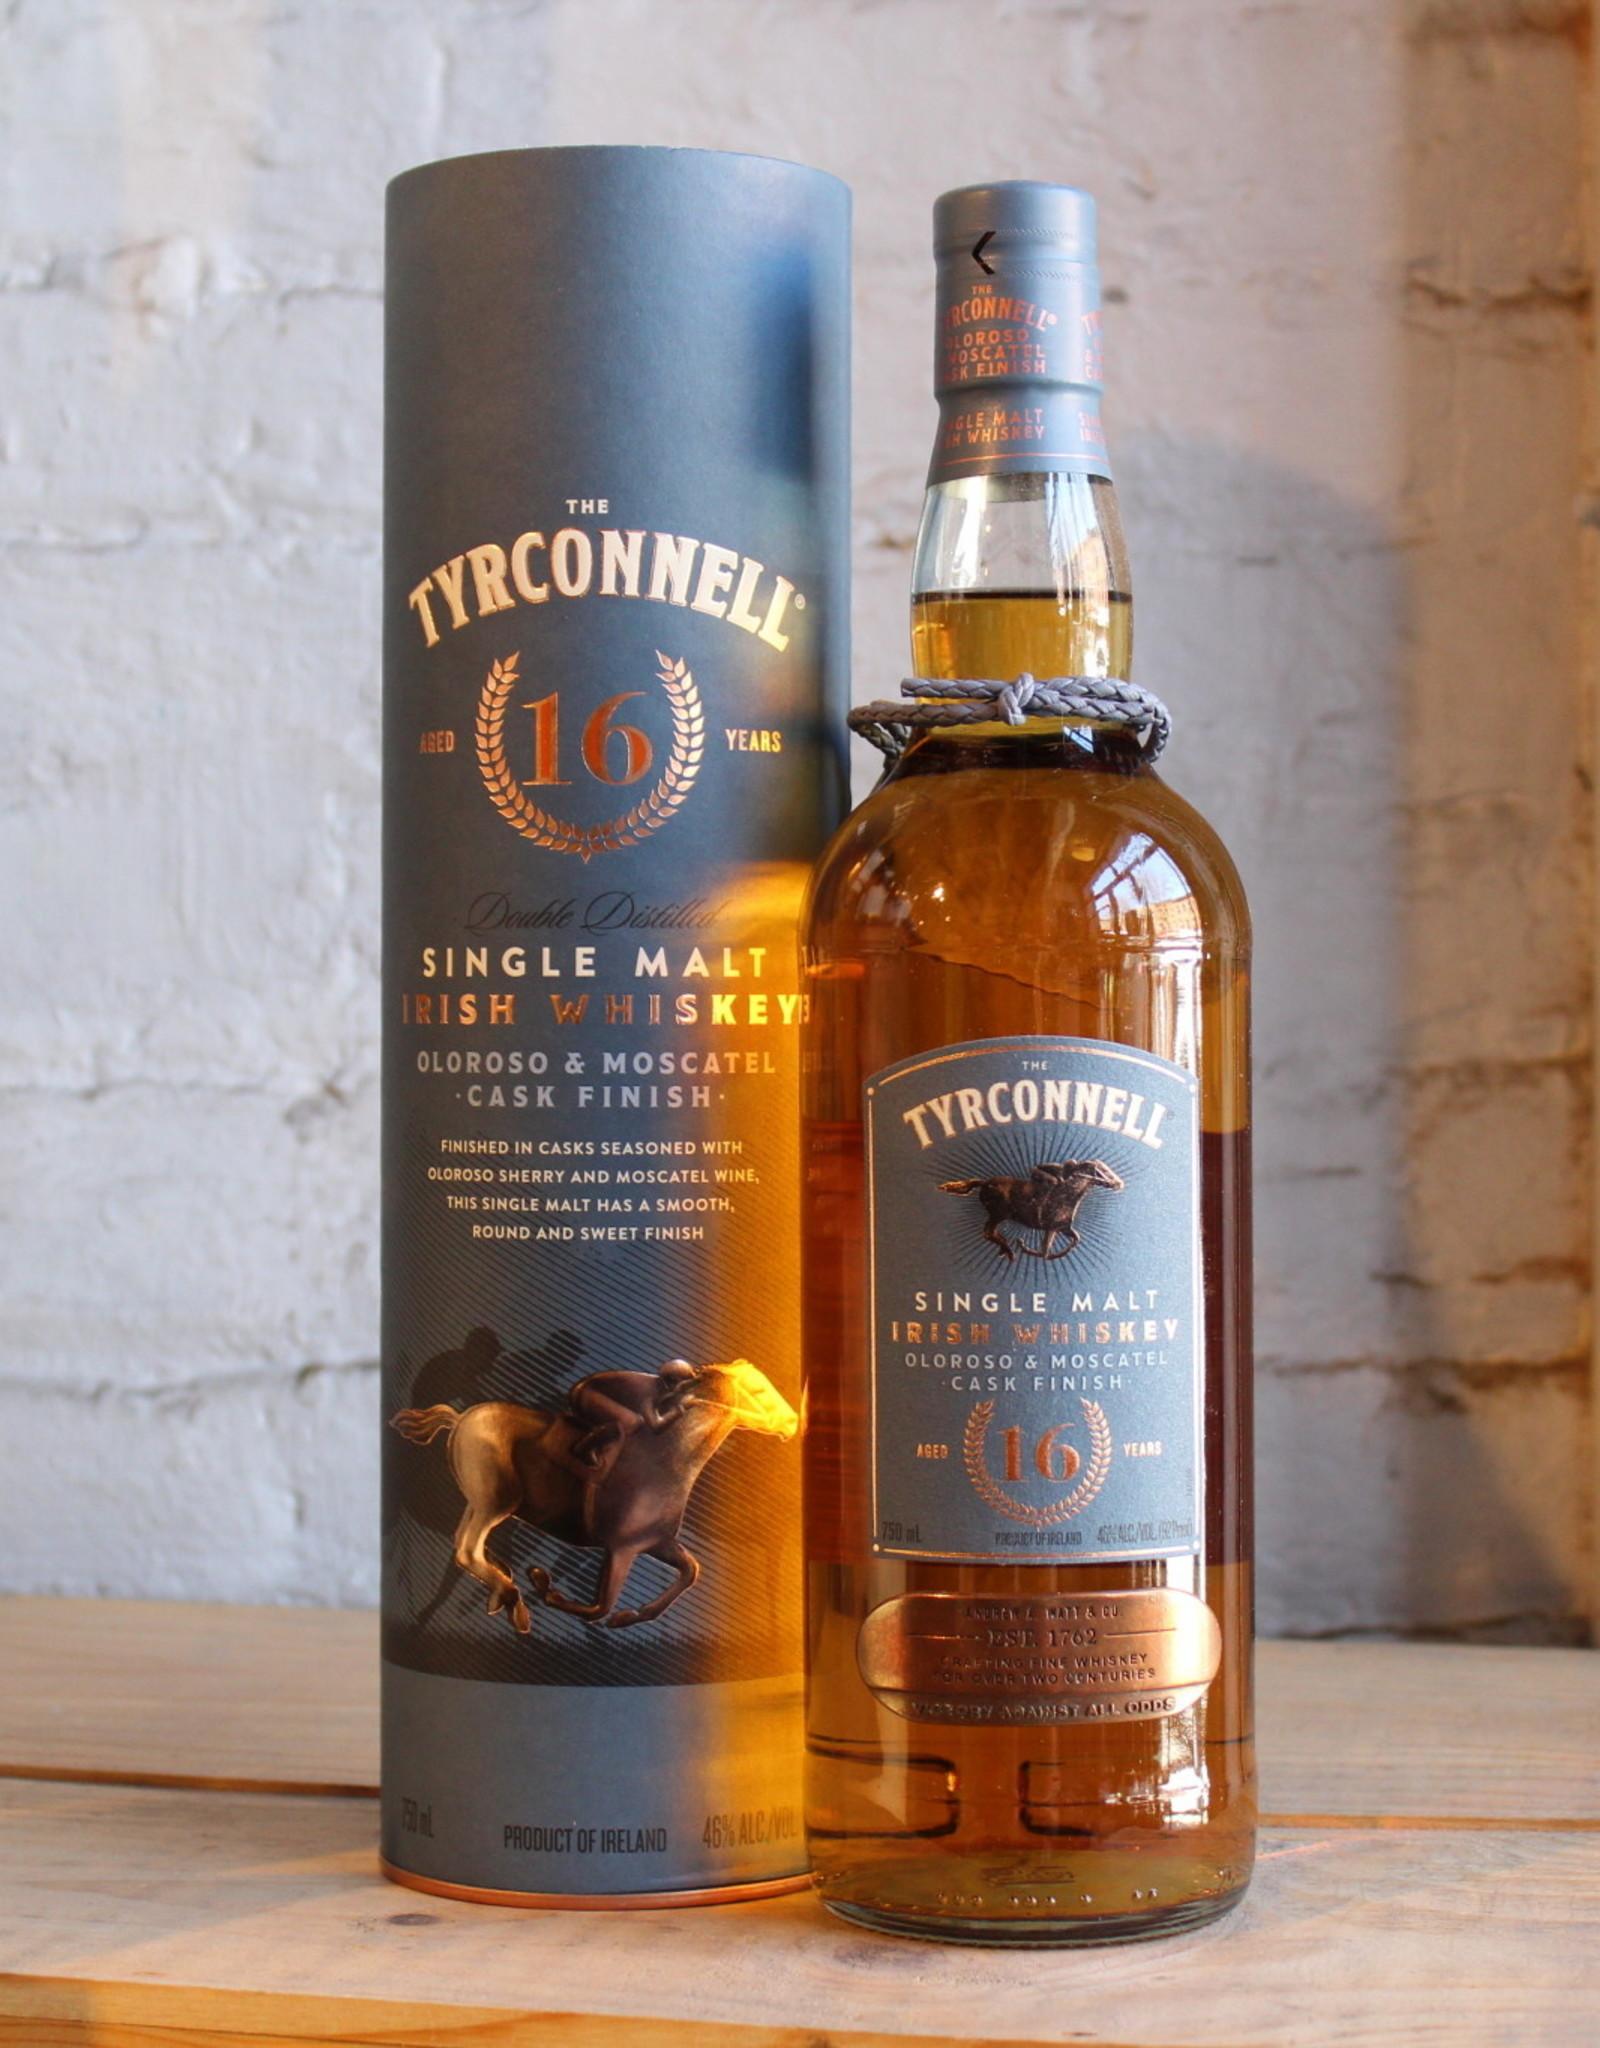 Tyrconnell Irish Whiskey 16 Year